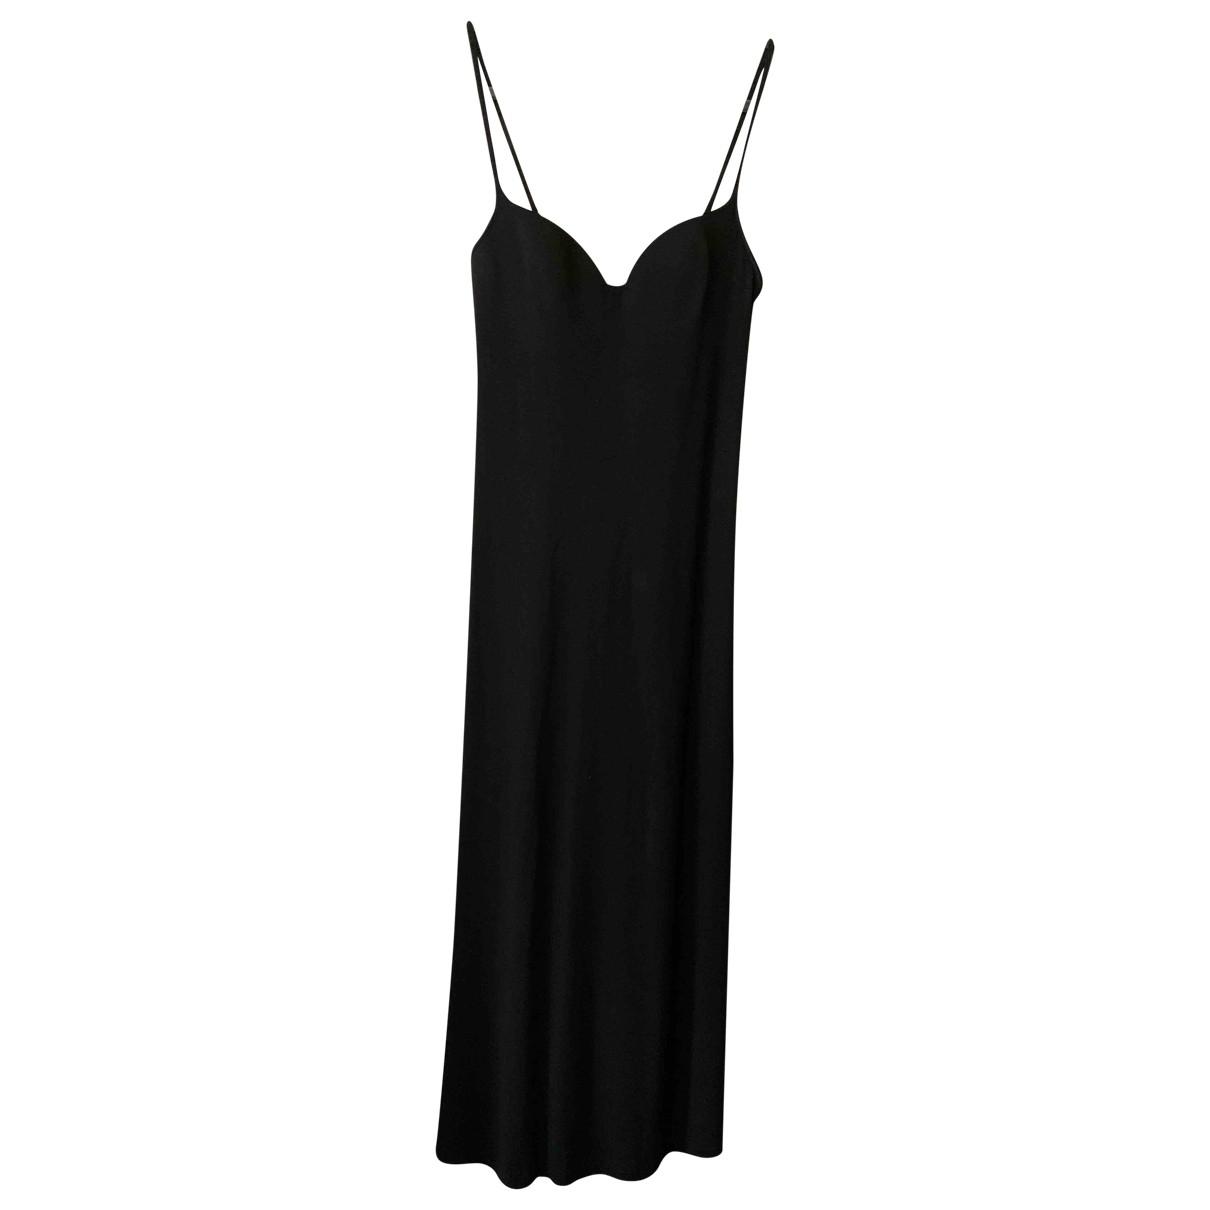 La Perla \N Black dress for Women 44 FR